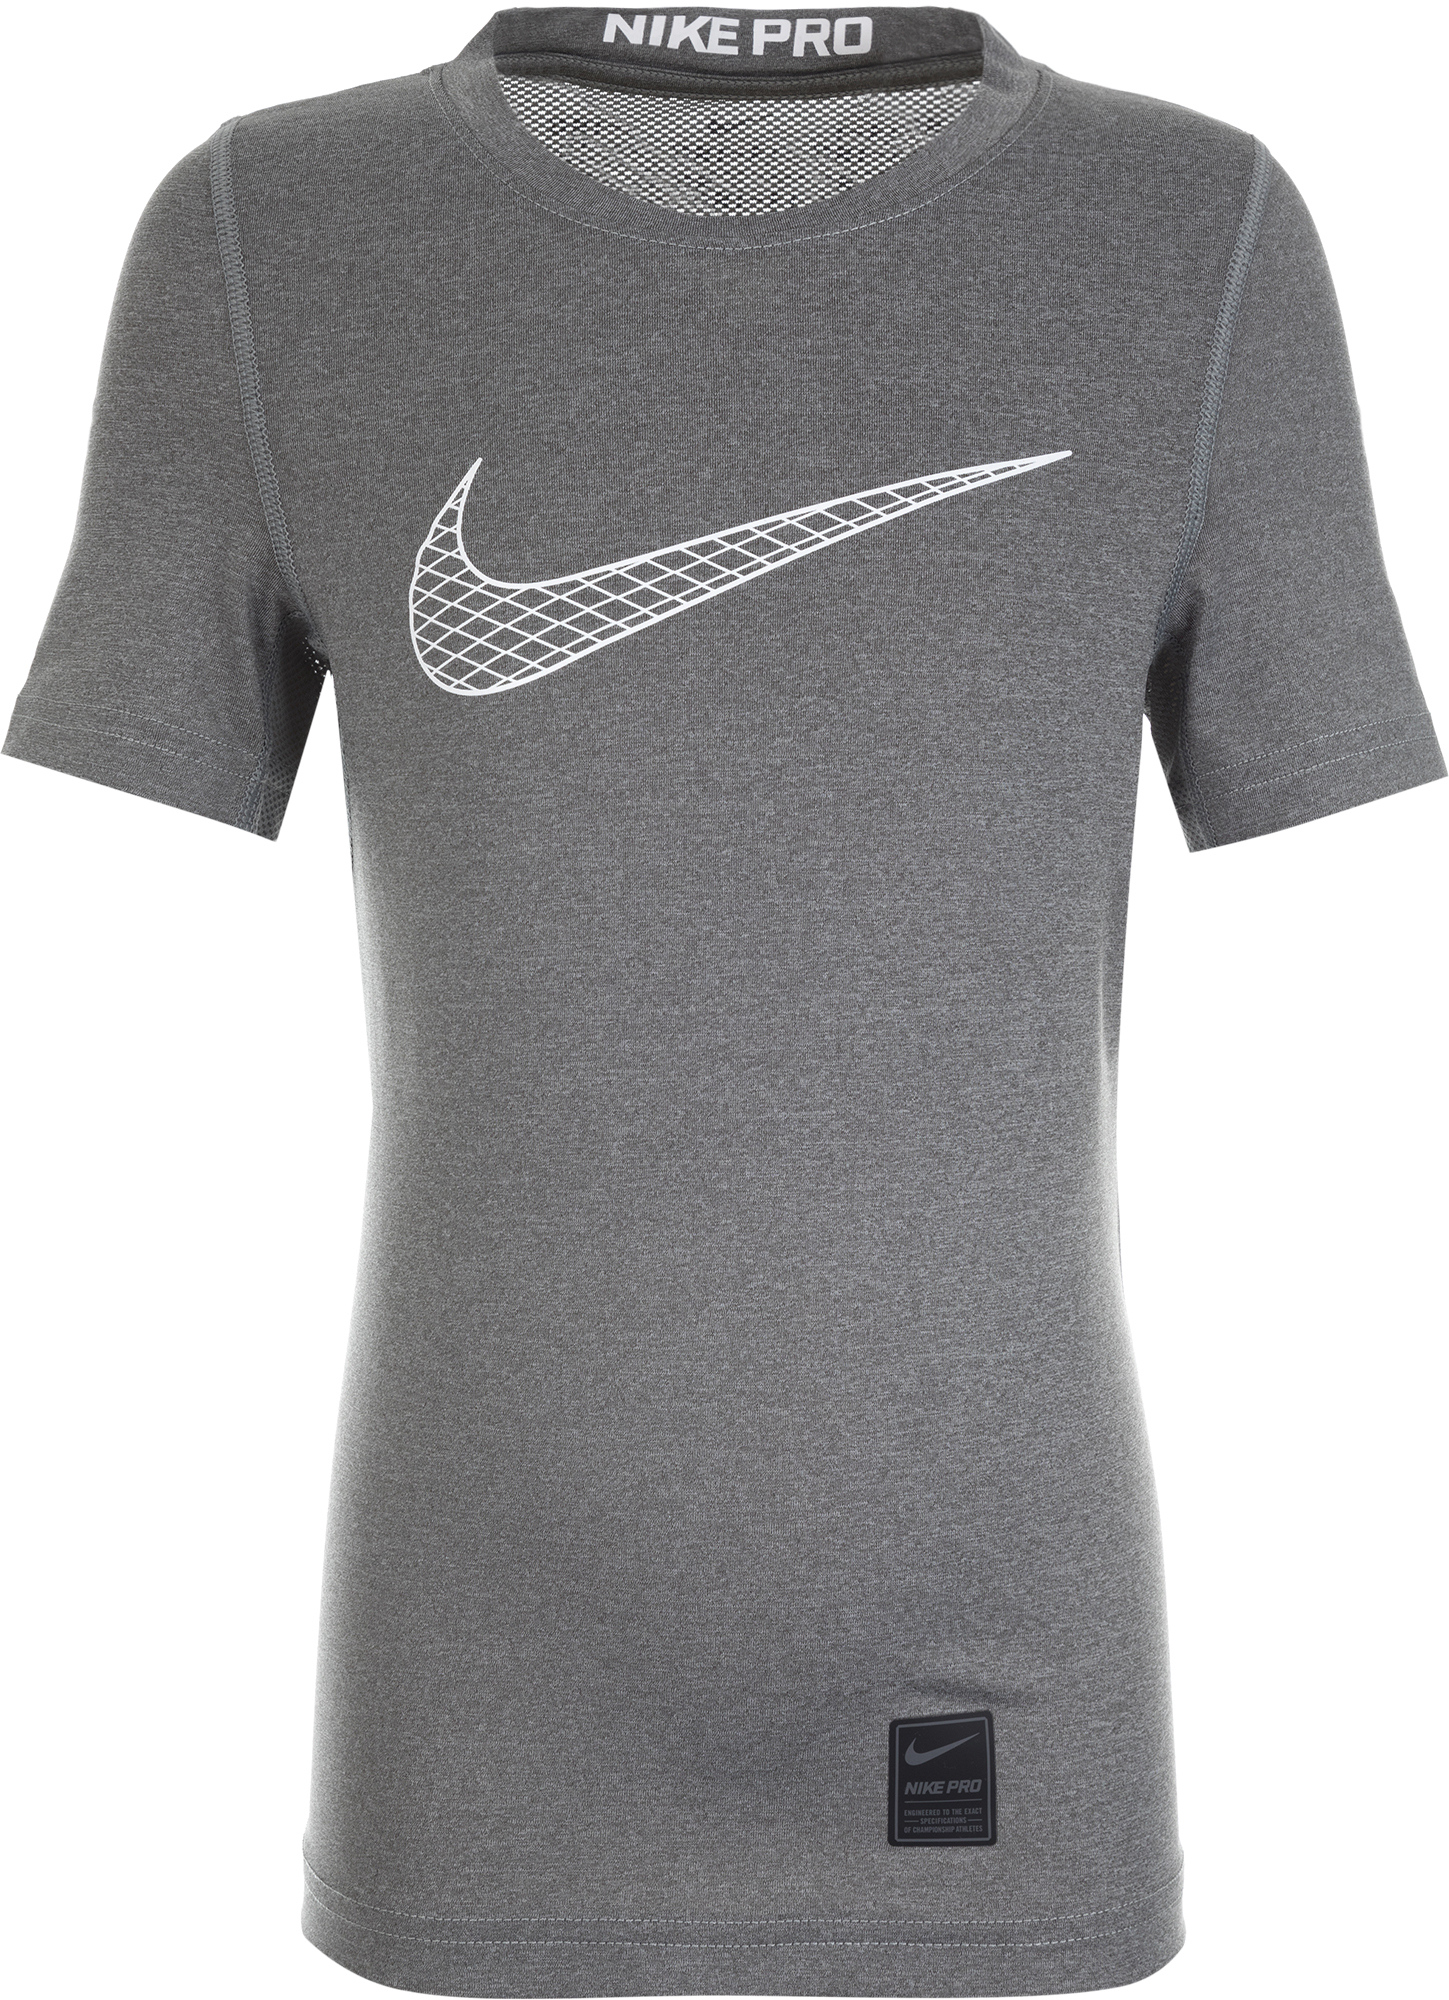 Nike Футболка для мальчиков Nike Pro, размер 158-170